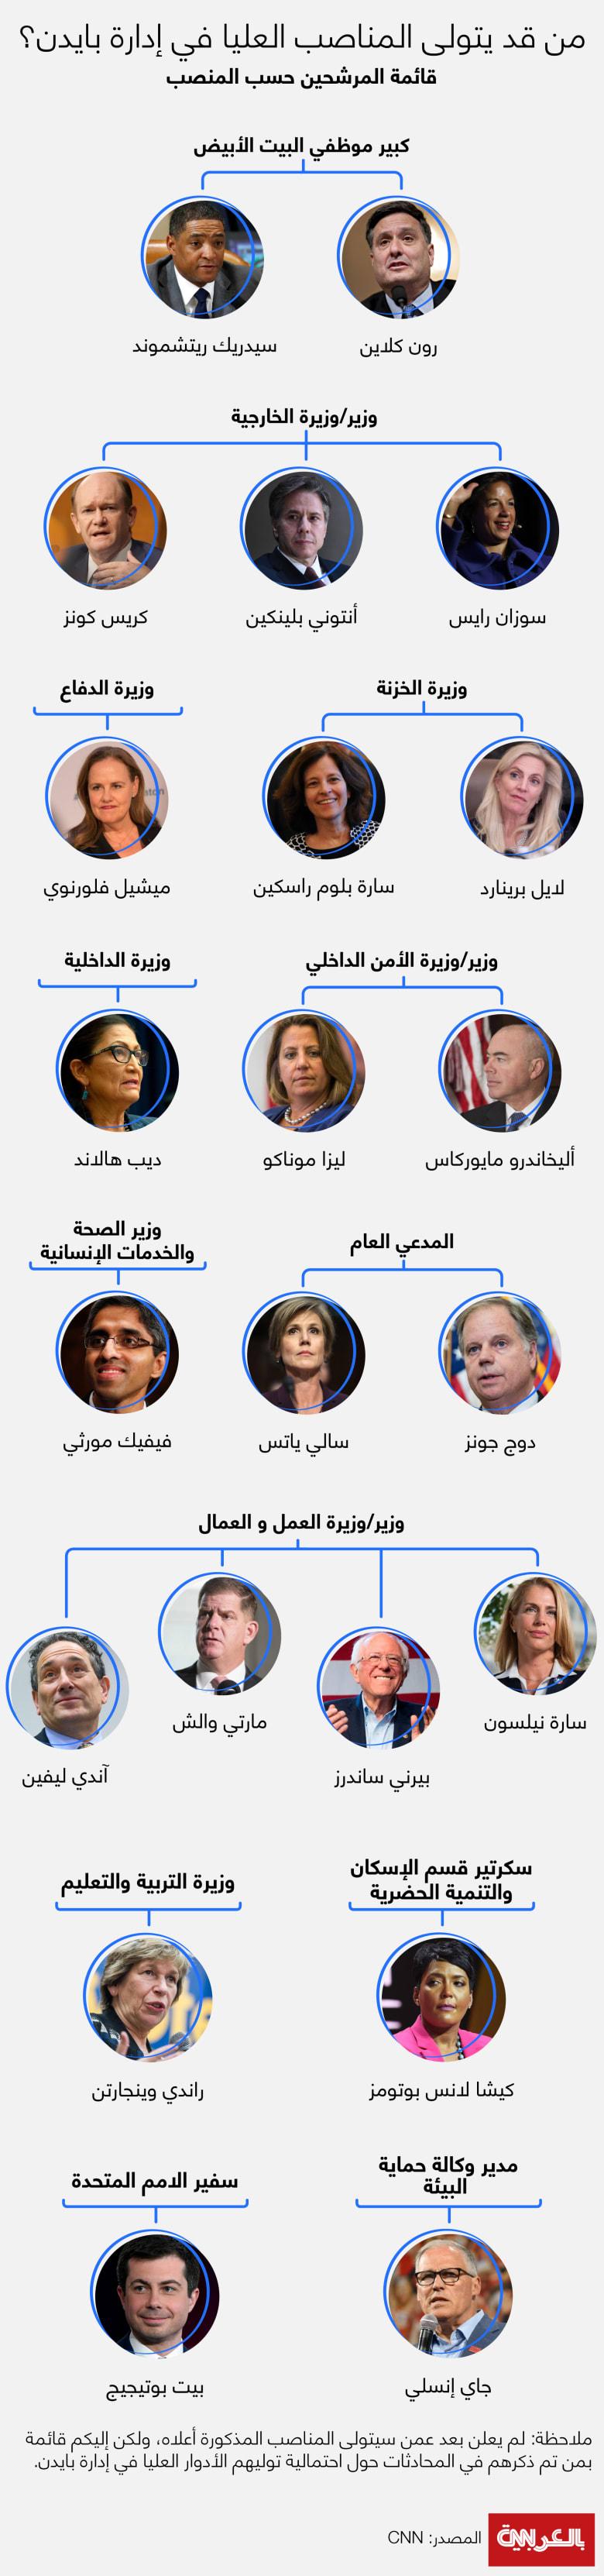 Top-roles-in-Biden-administration